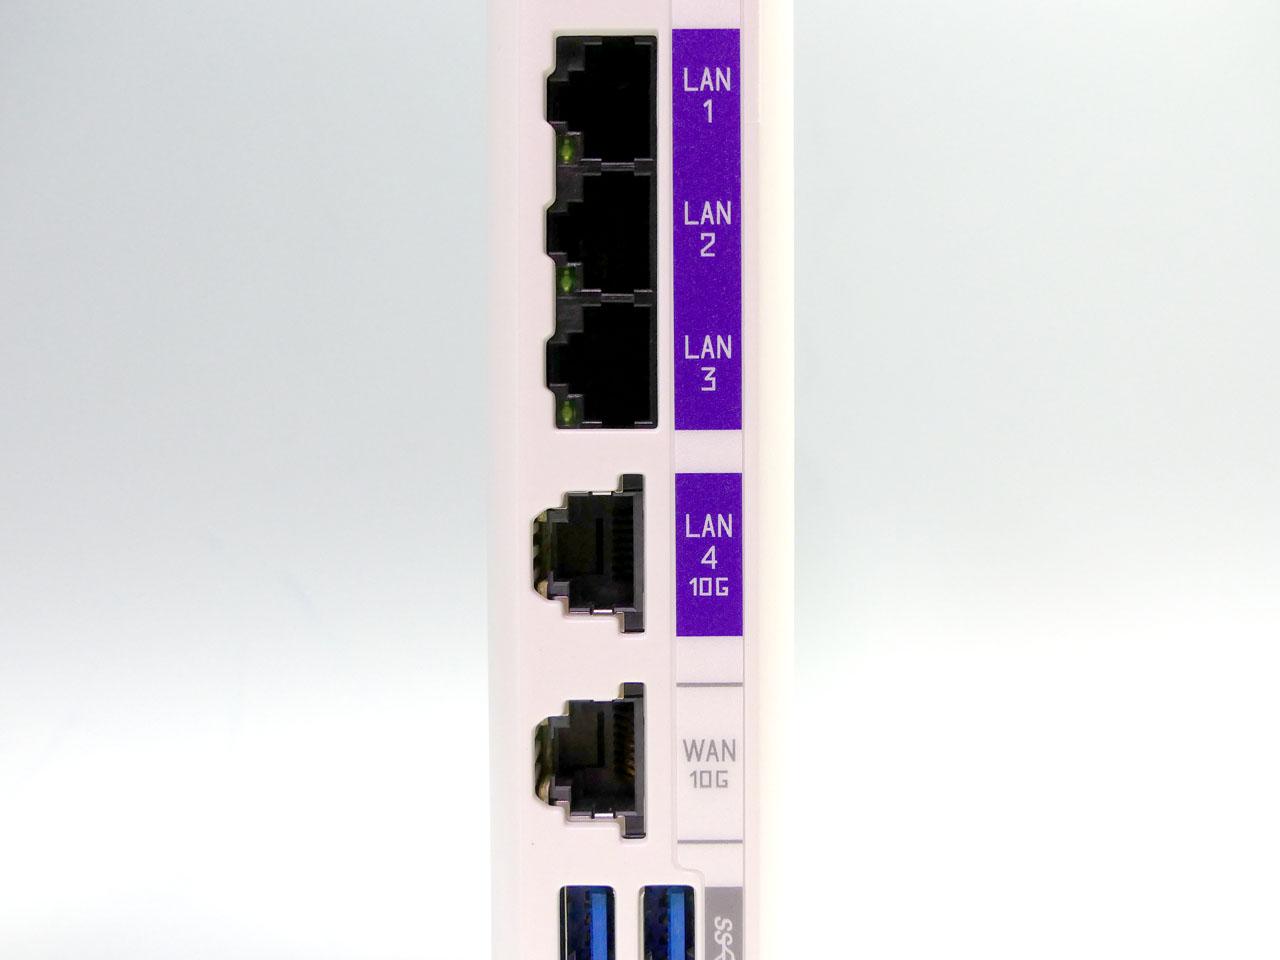 LANポートは3つが1Gbps、10Gbps対応の10GBASE-Tは1ポートのみ